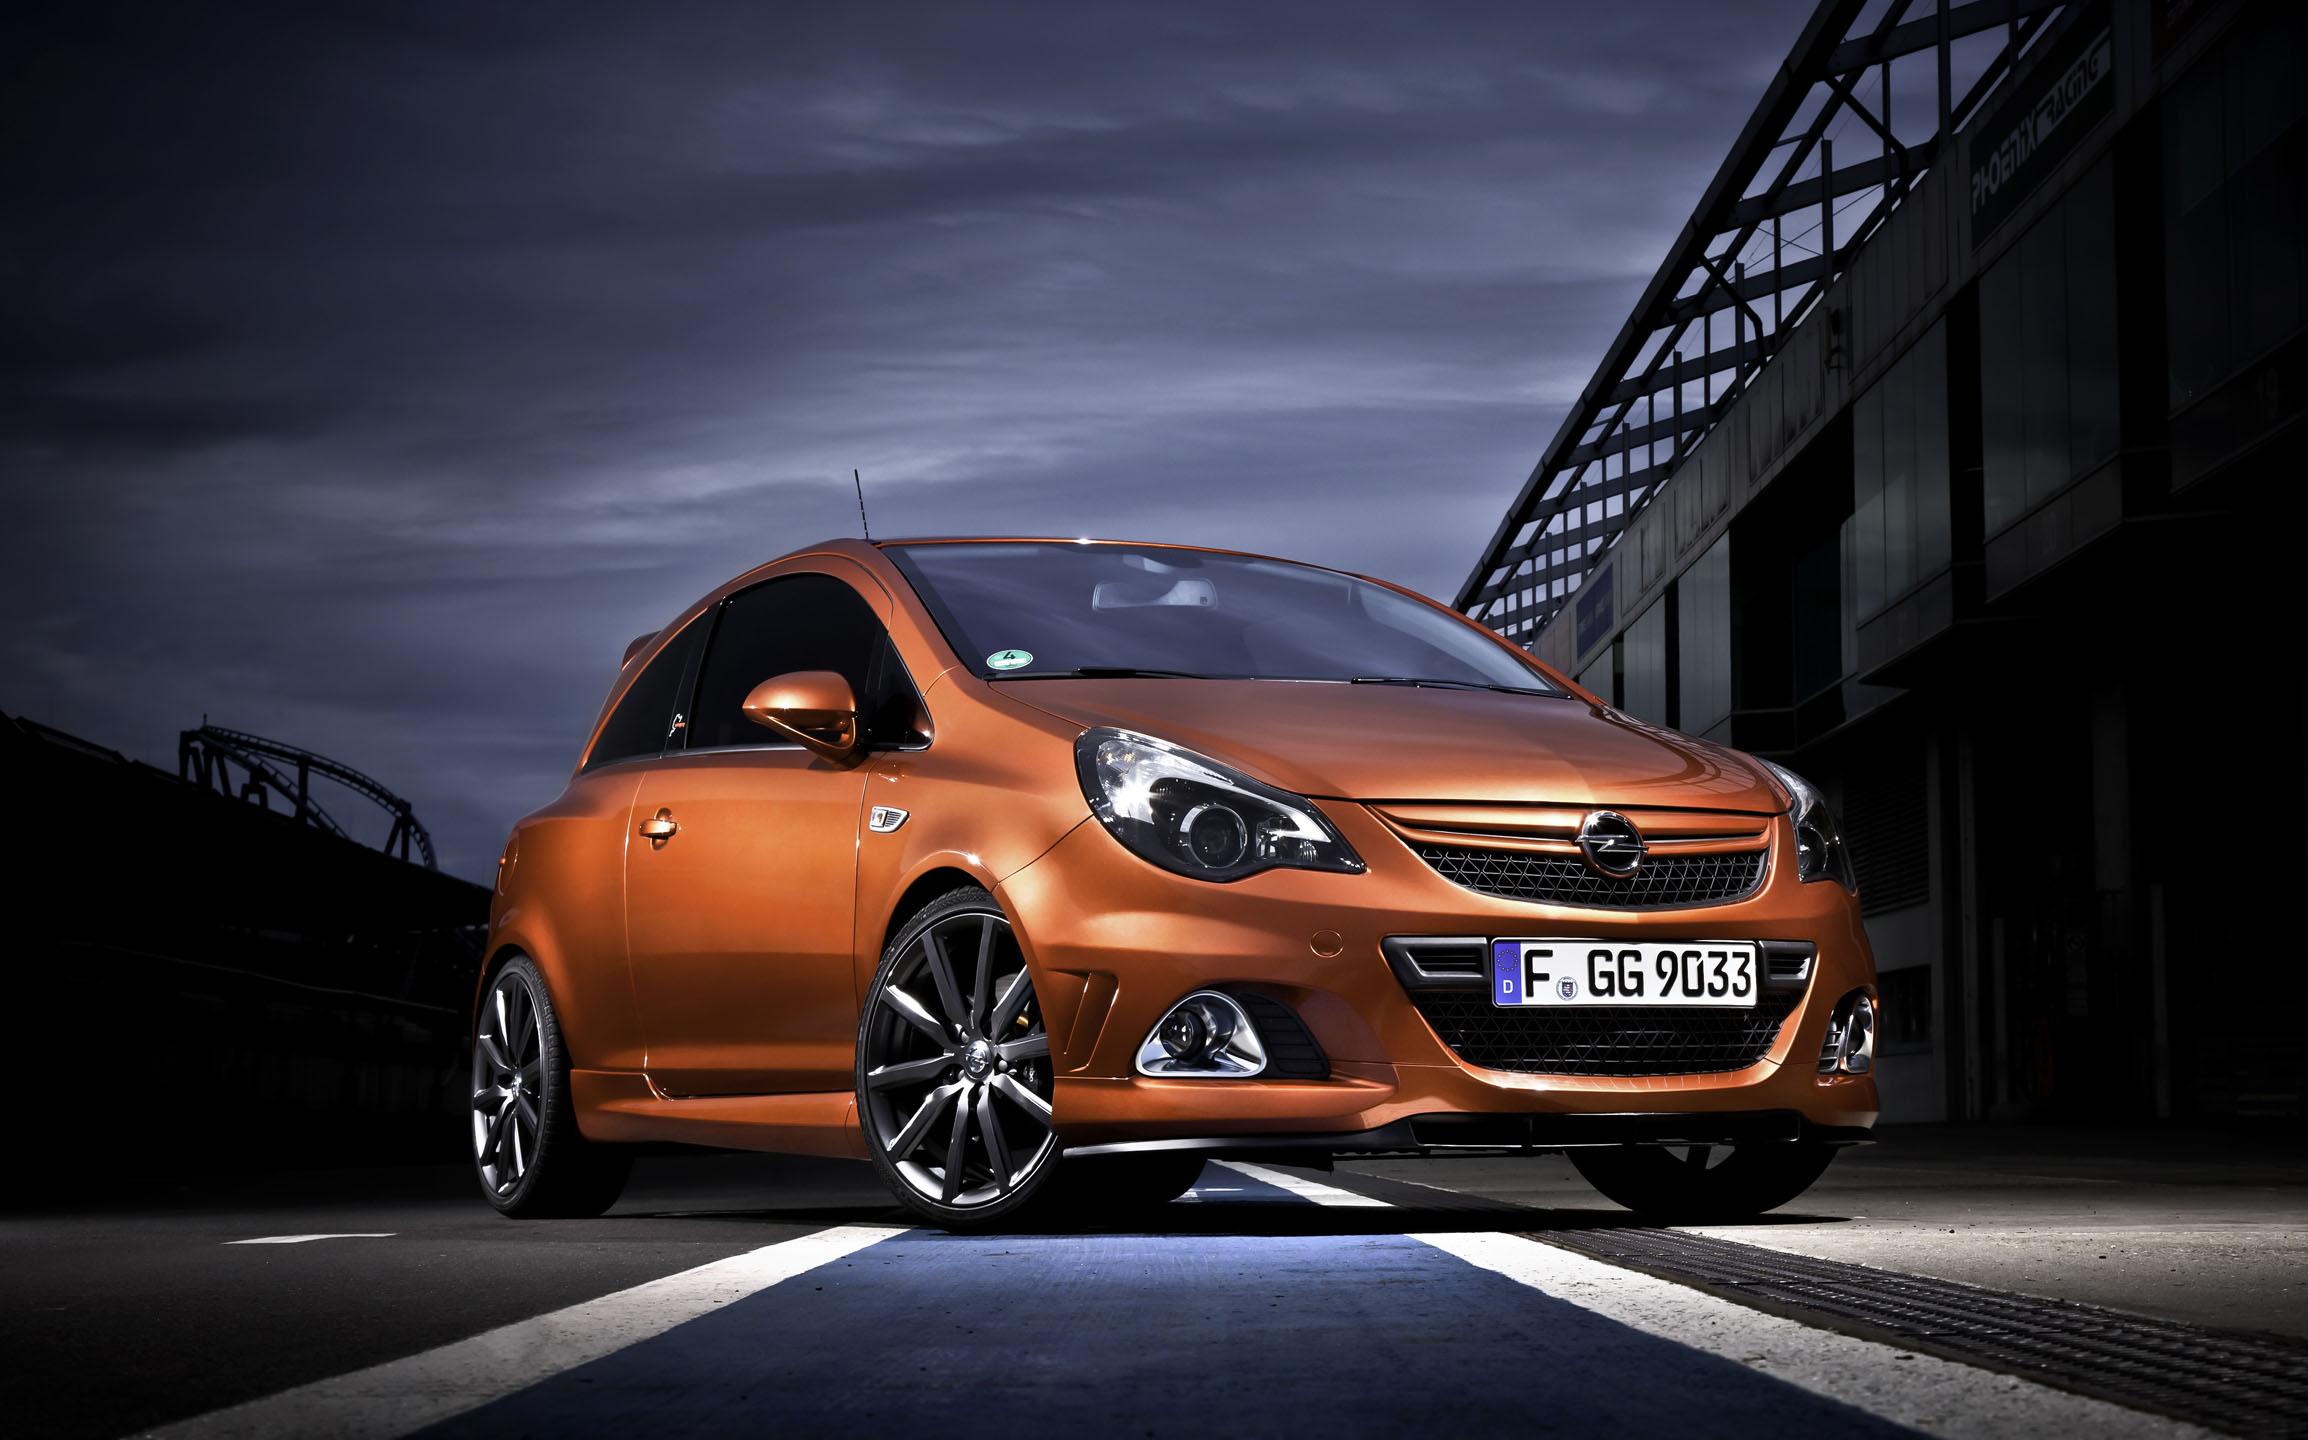 Confirmed: Nurburgring Opel Corsa OPC For SA